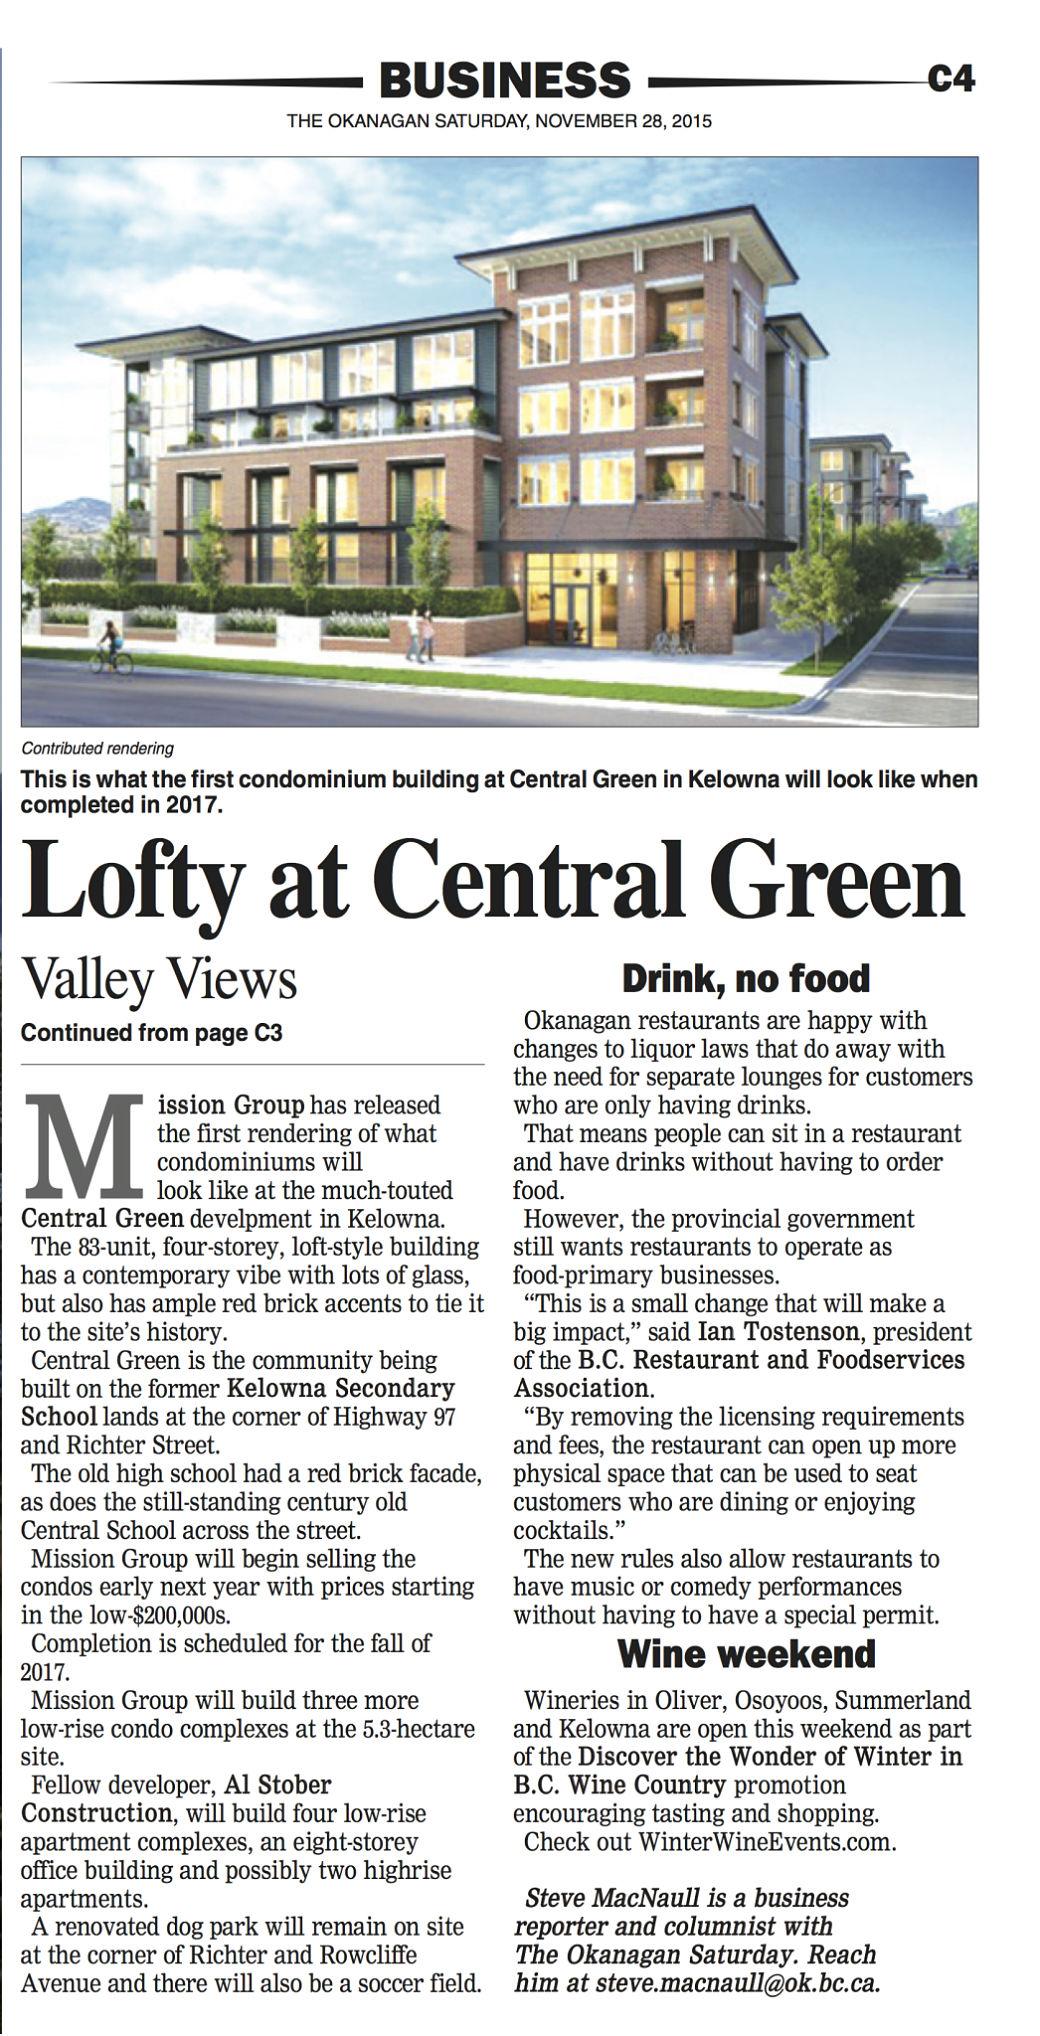 news-central-Green-Okanagan-Saturday